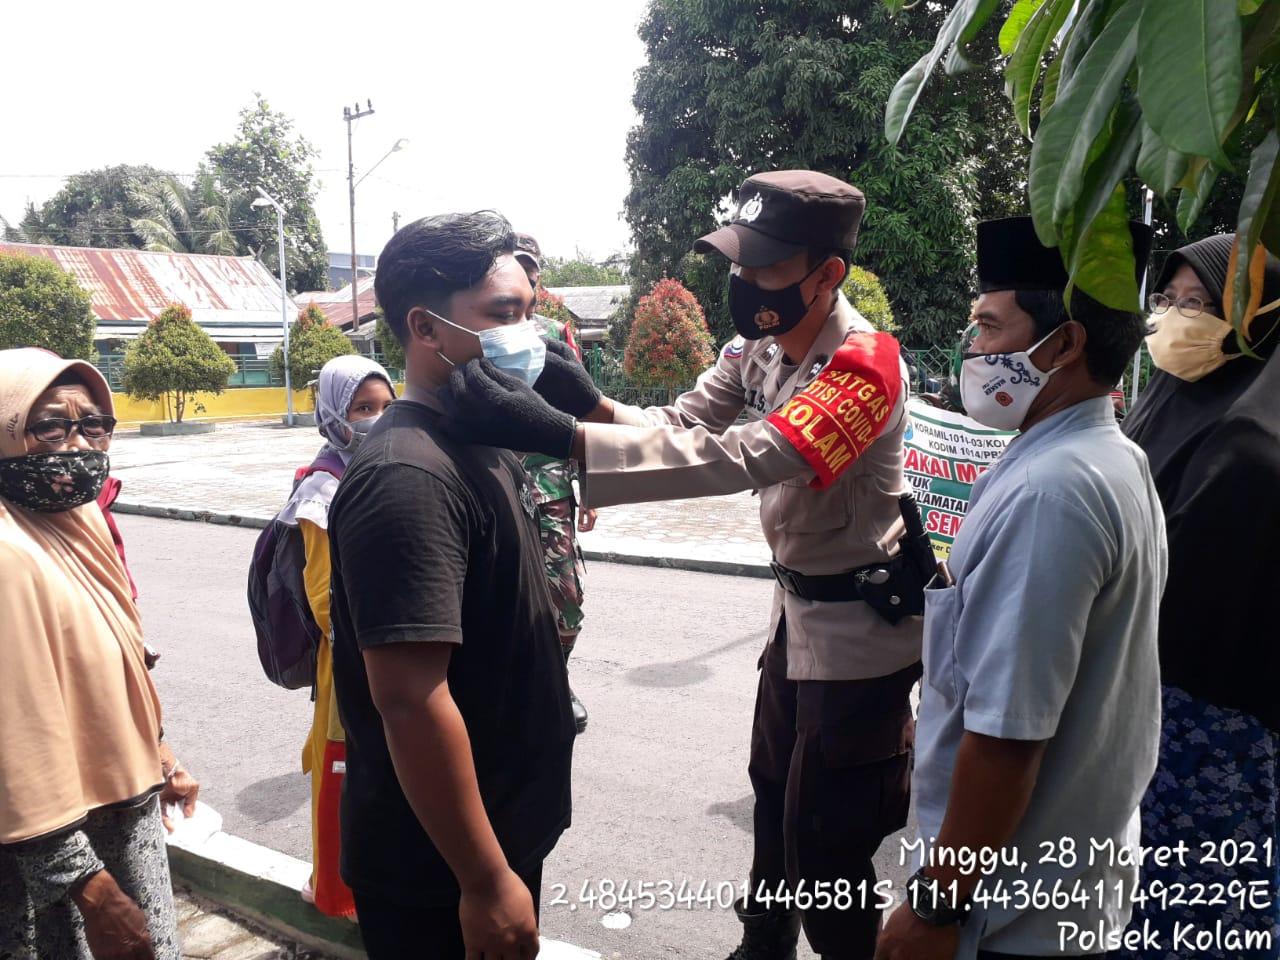 TNI / POLRI PEDULI KESEHATAN WARGA KEC. KOLAM DENGAN BERIKAN MASKER 1